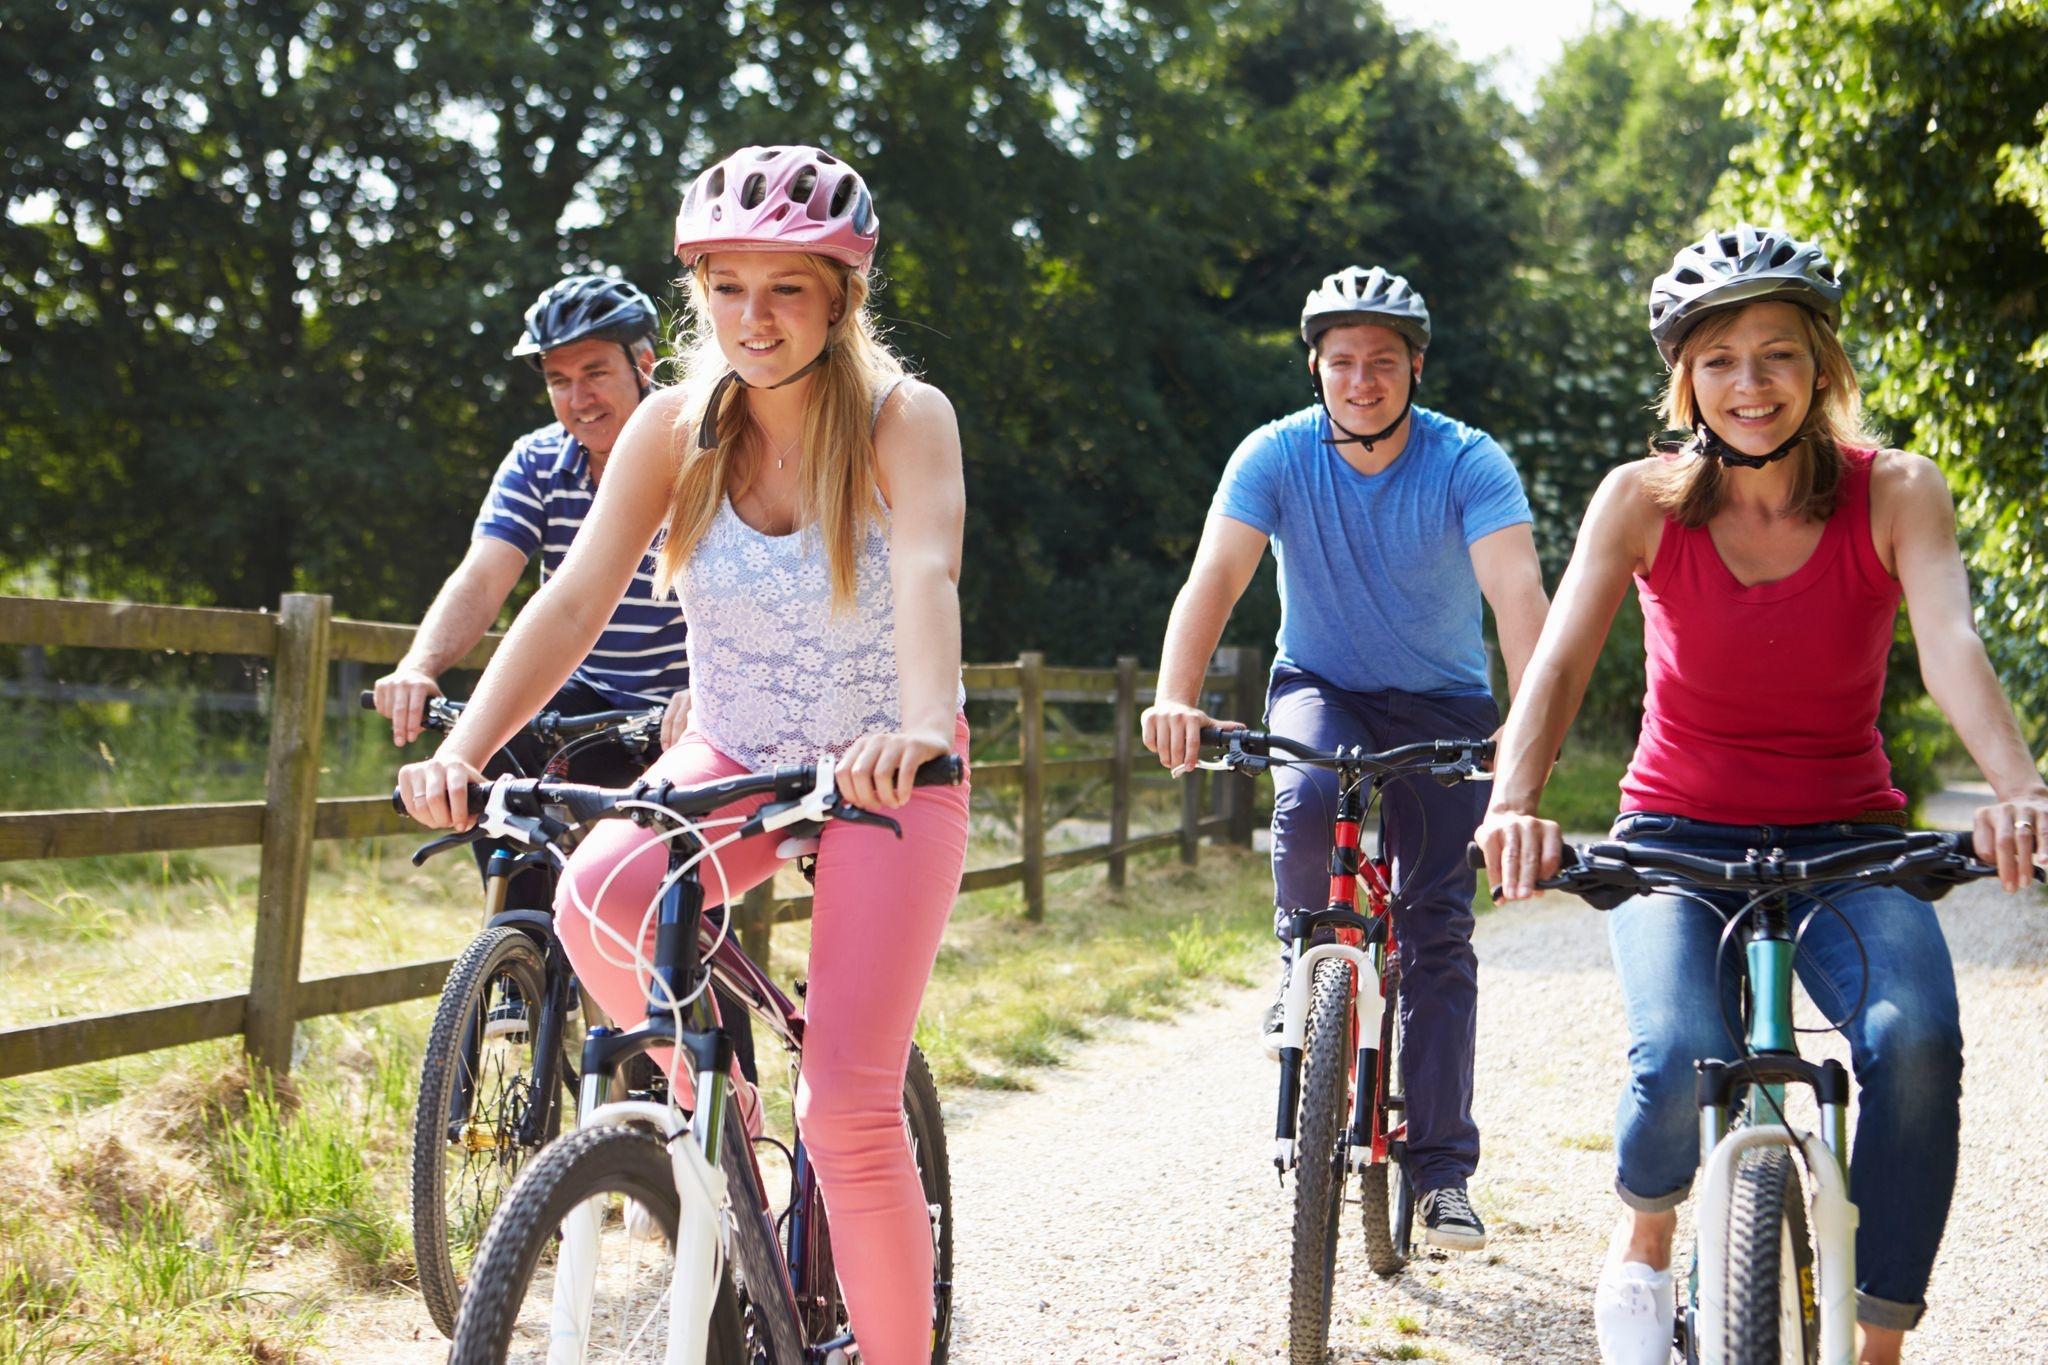 Biking on Hilton Head: Tips & Rules of the Road